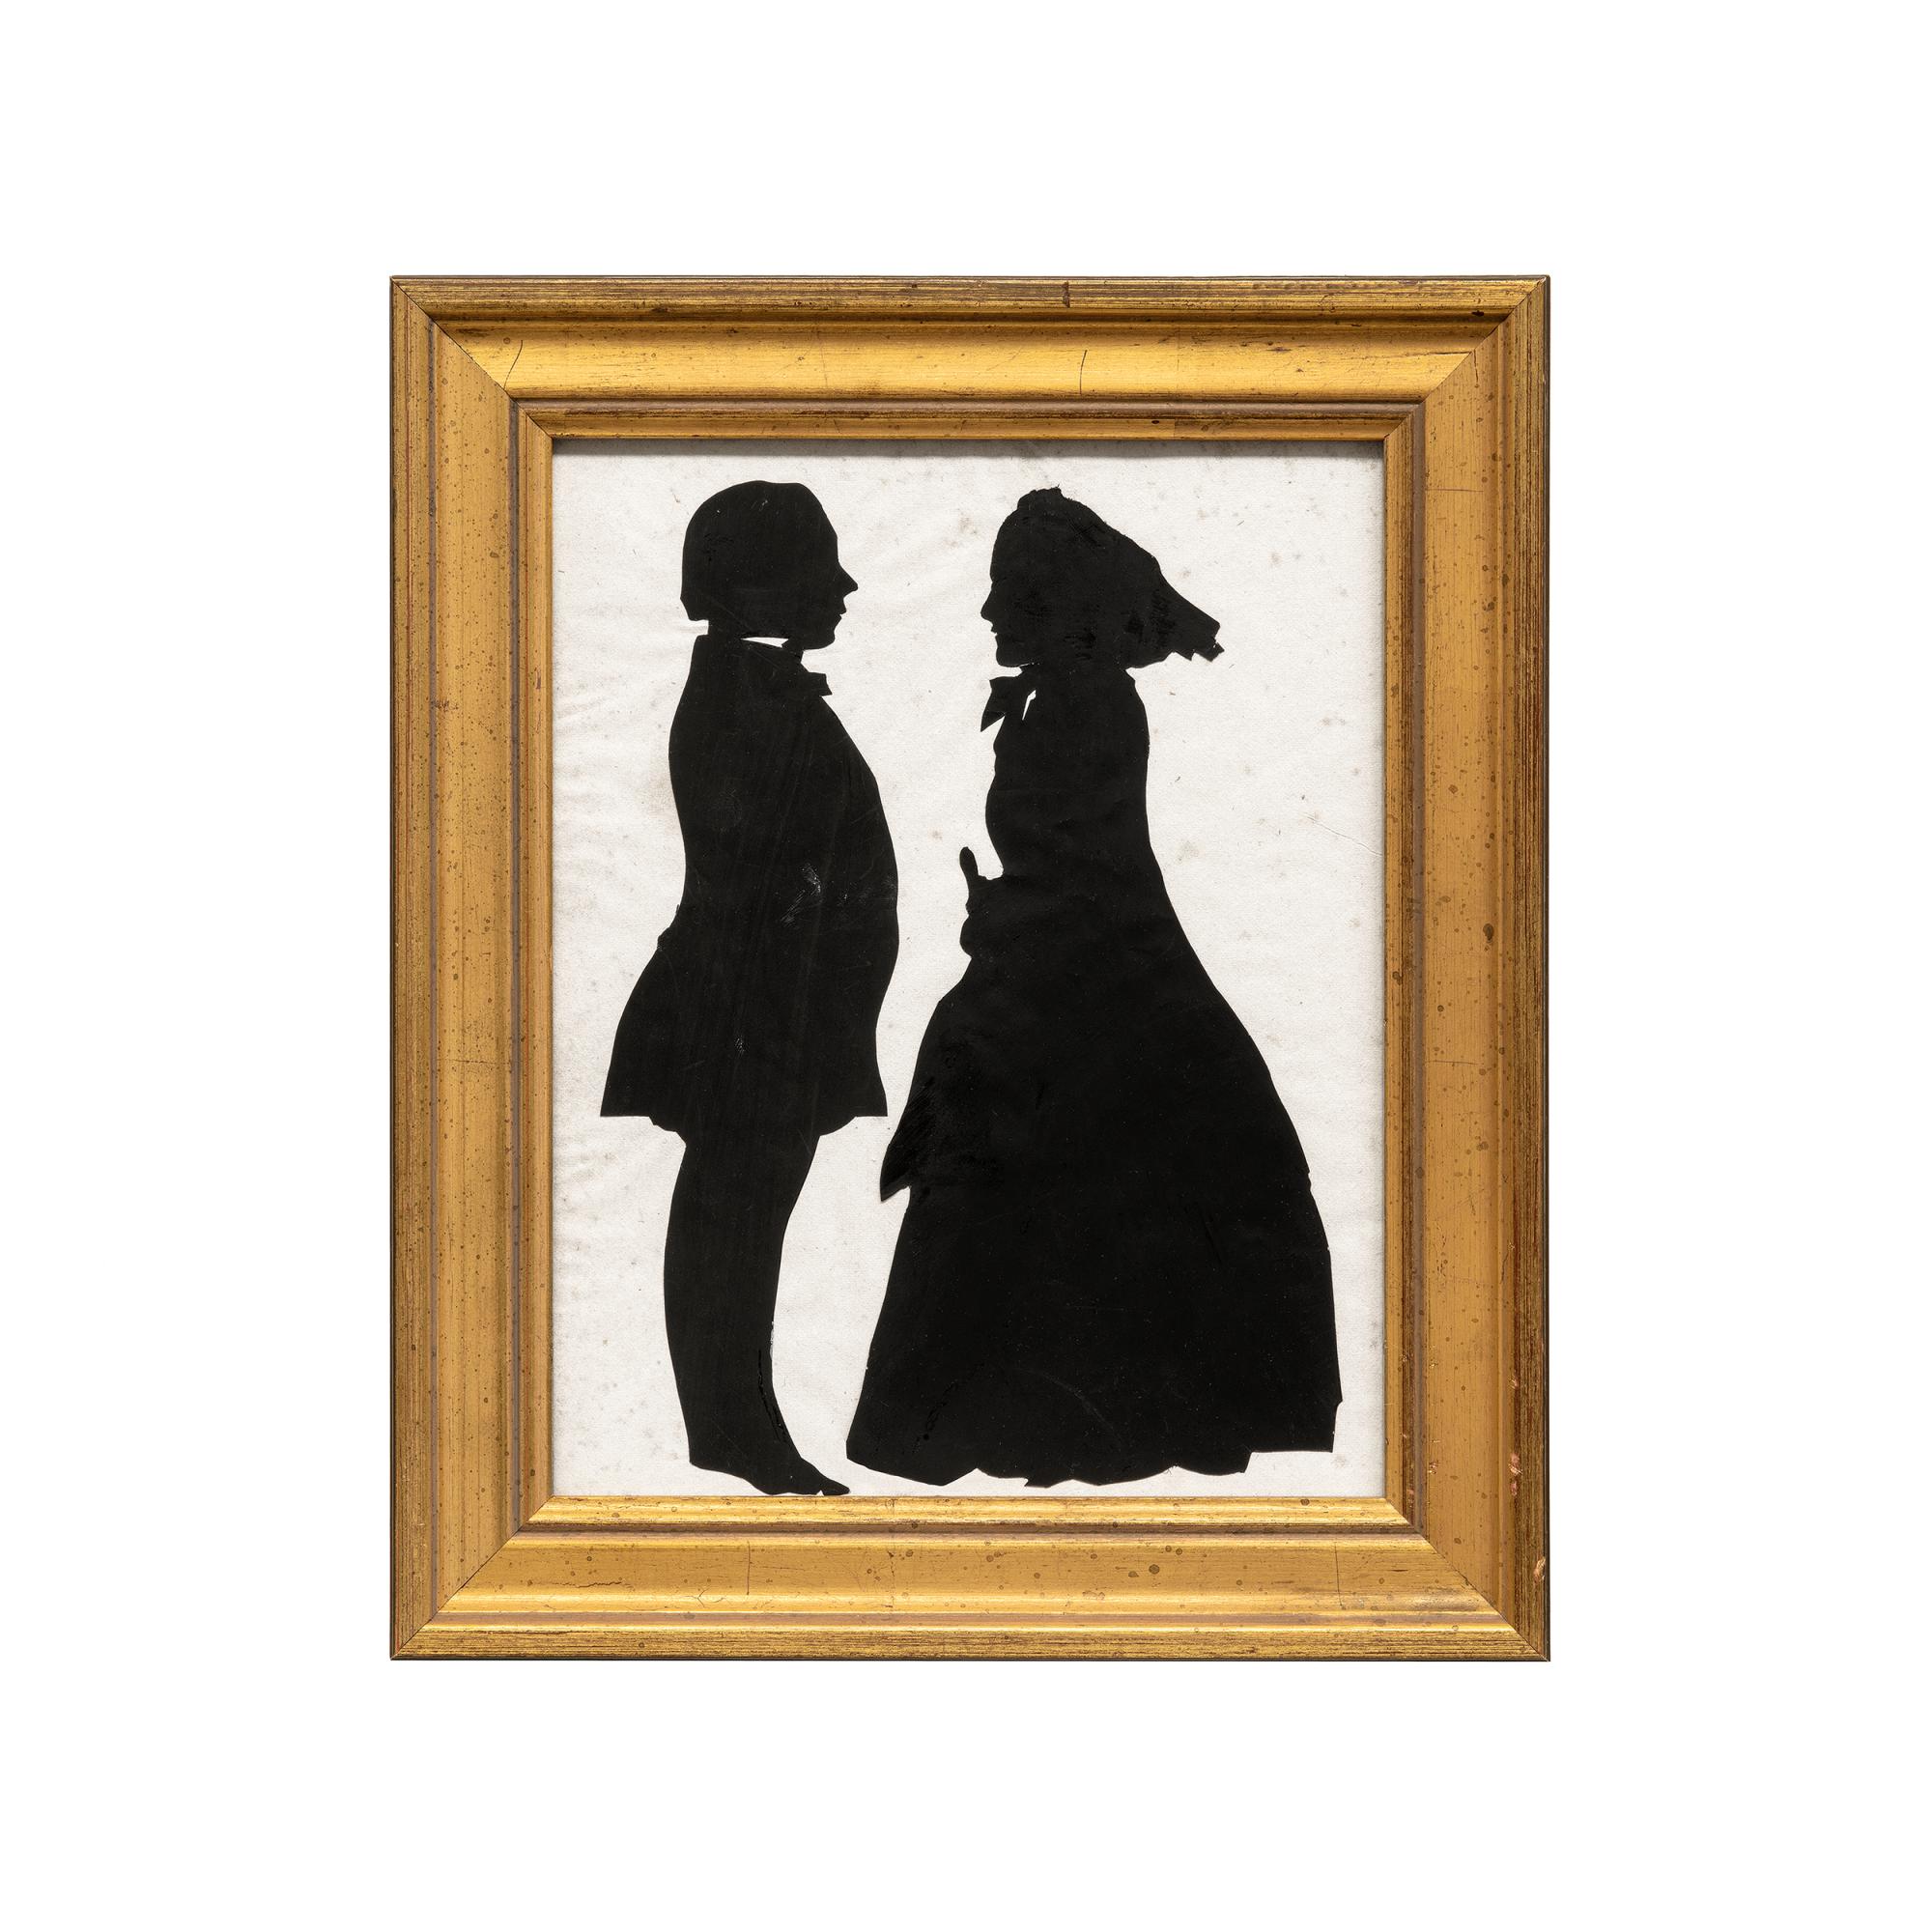 Antique Framed Silhouette